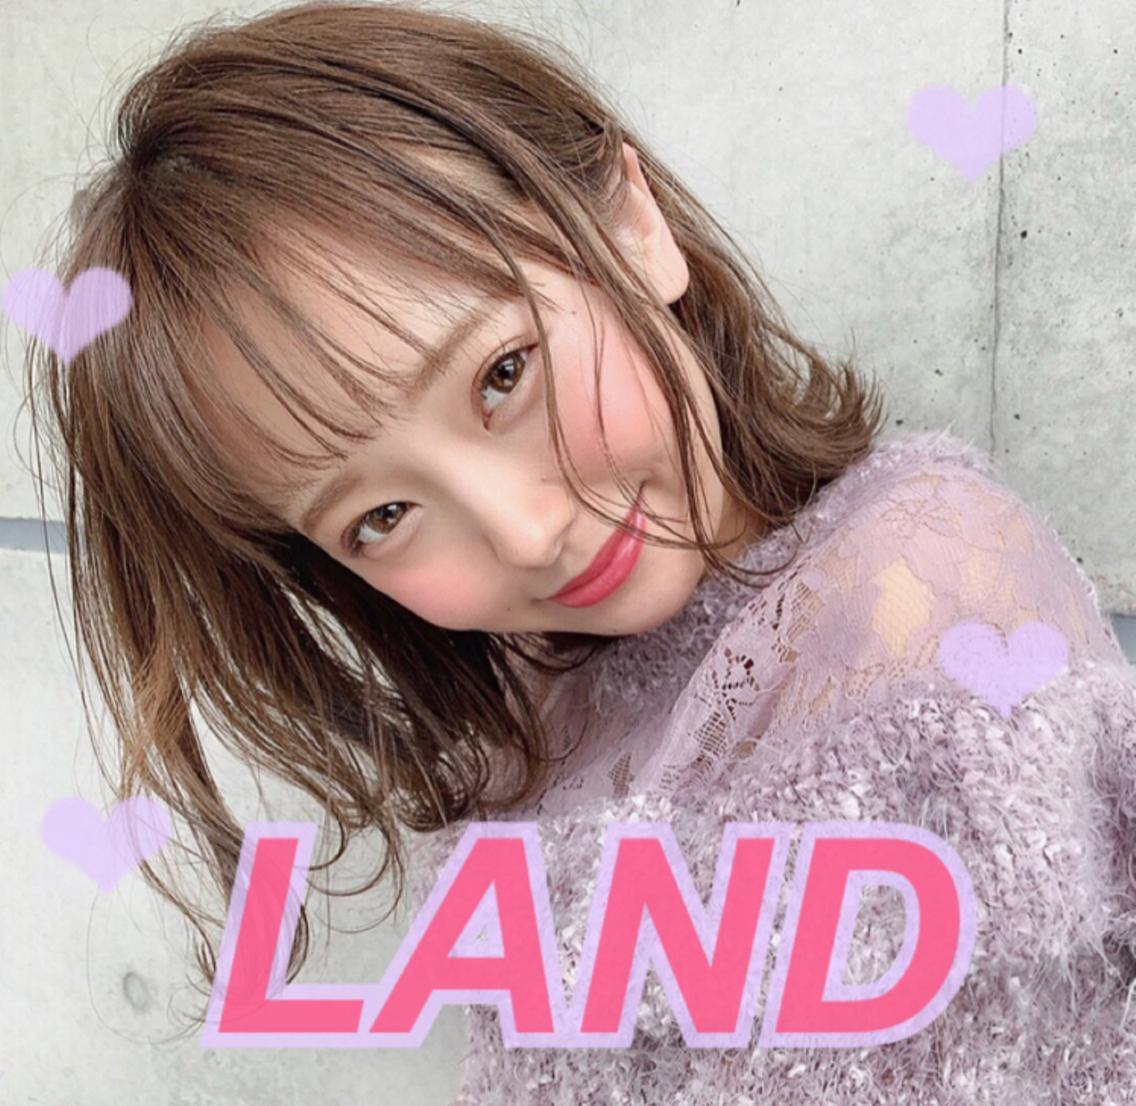 LAND(SHE)所属・💗女性大人気 💗YUUNA💗の掲載